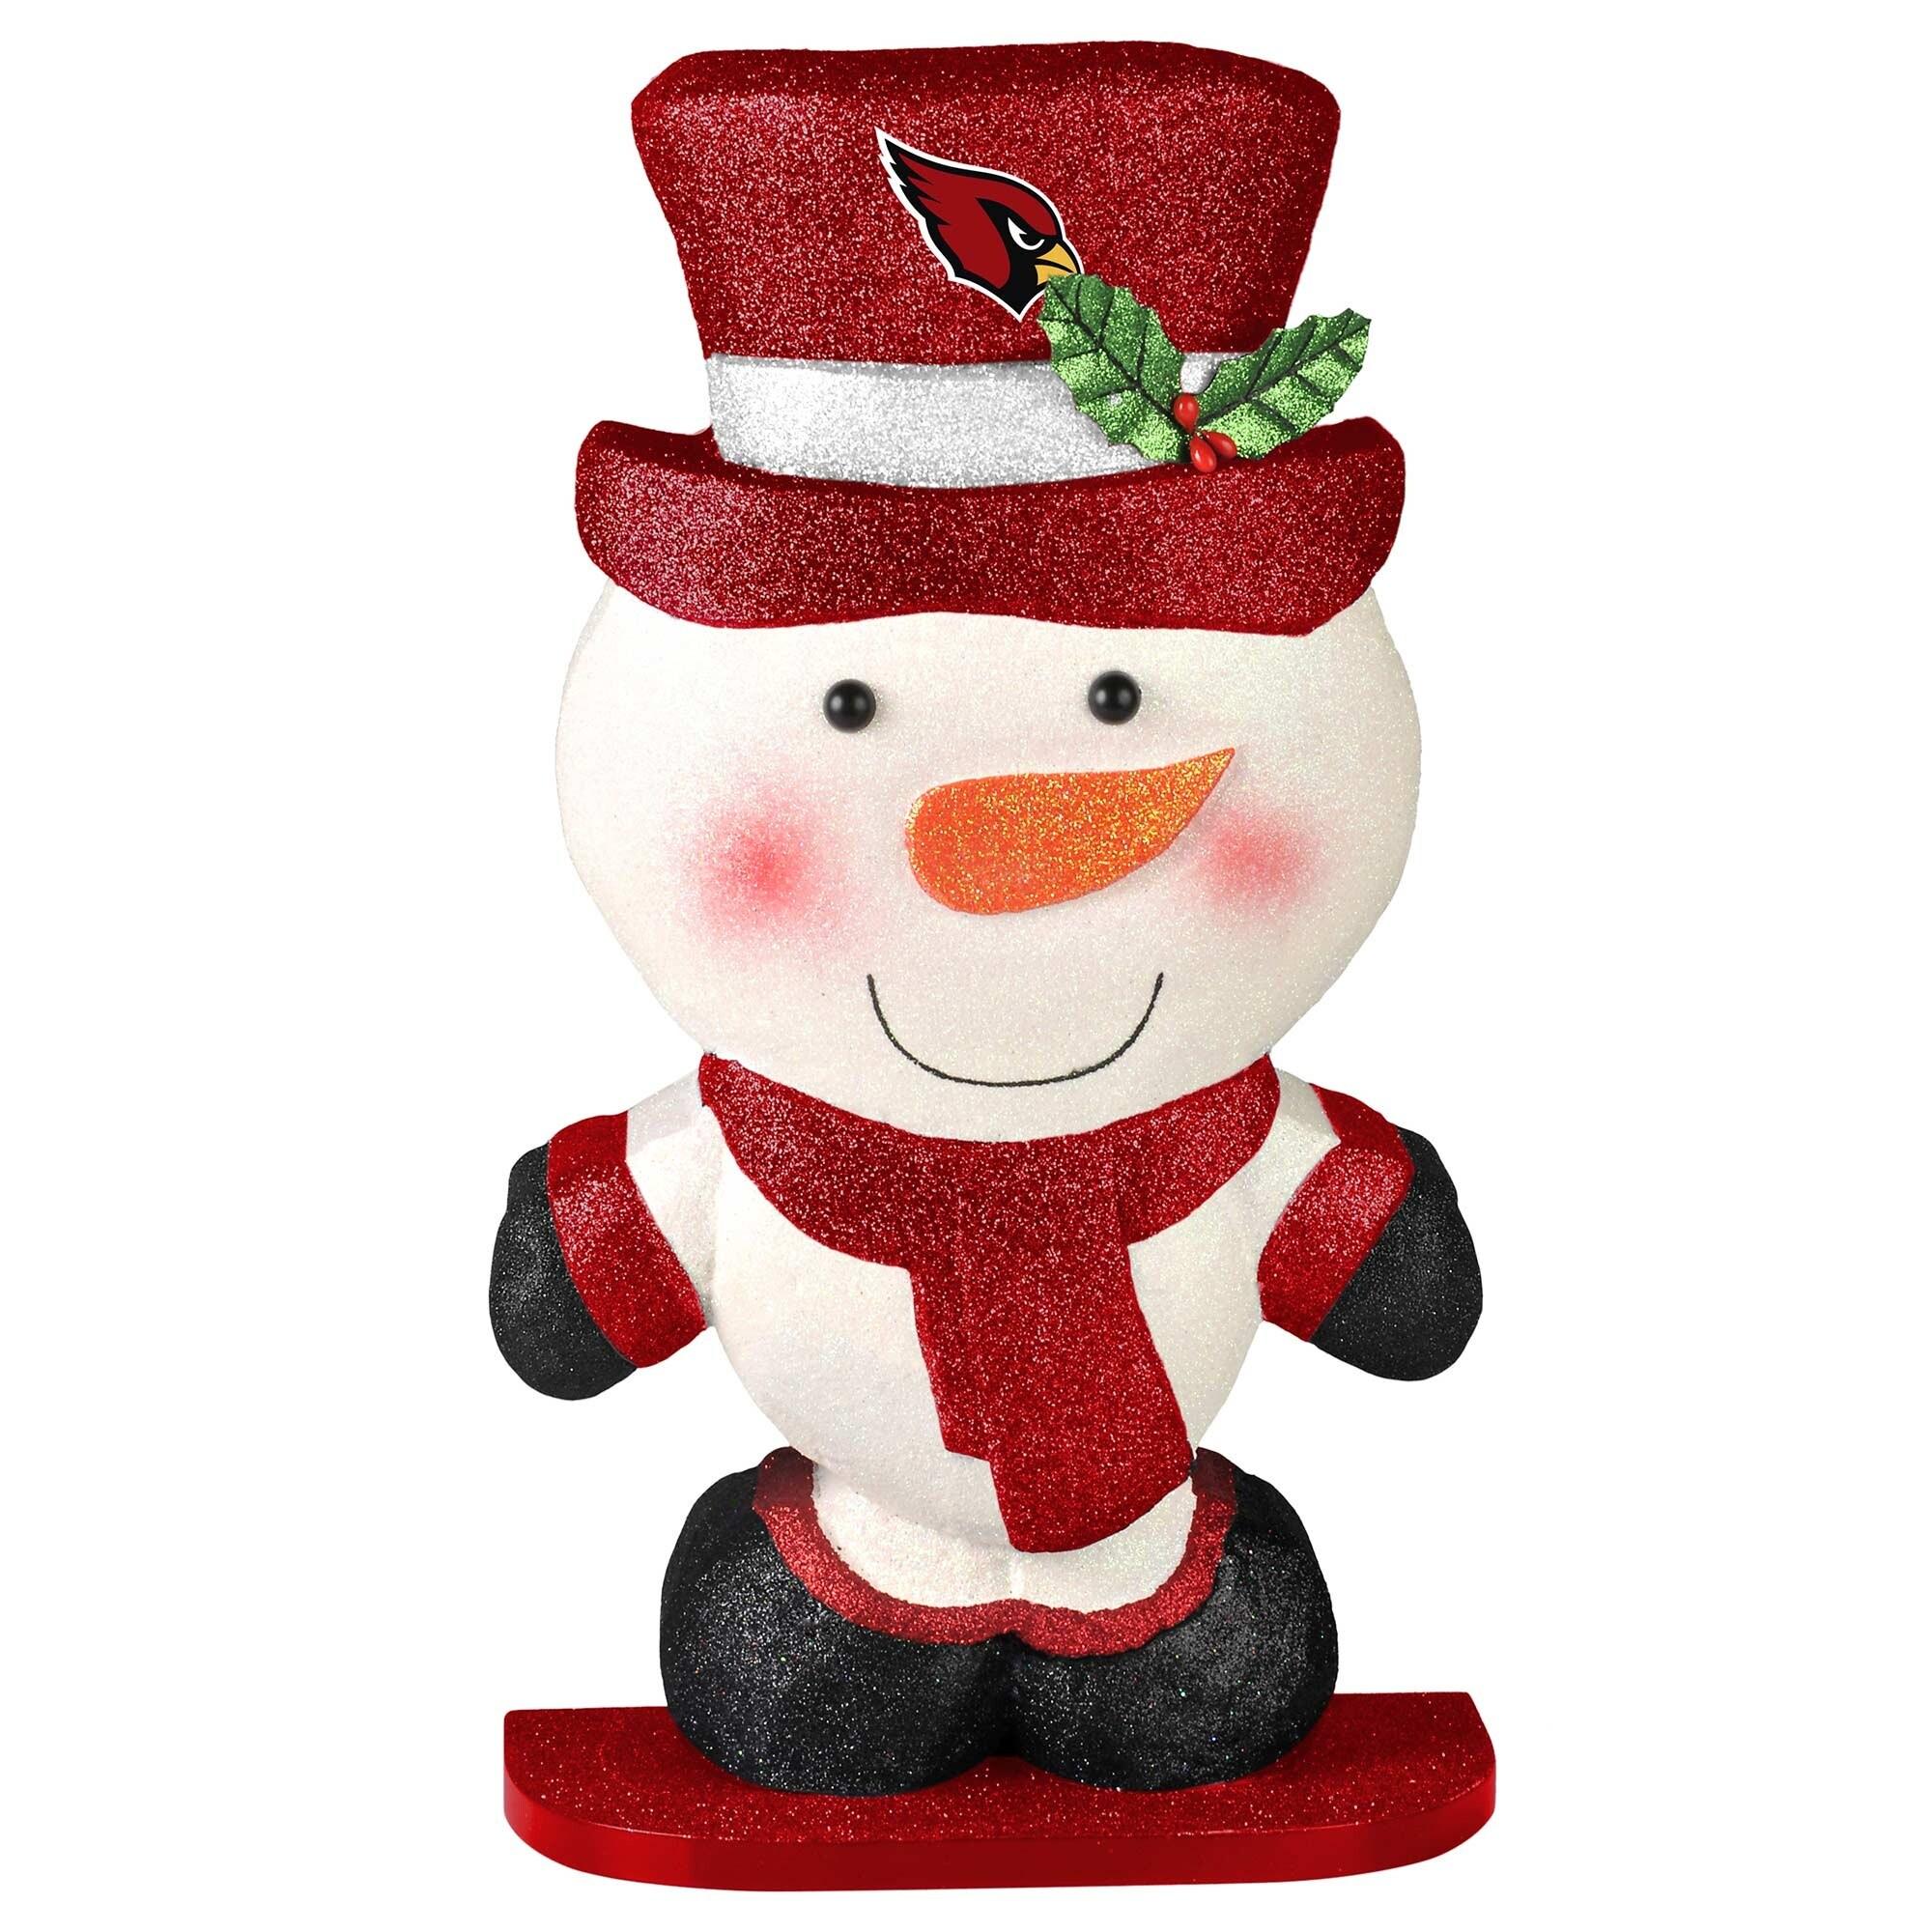 Arizona Cardinals Polystyrene Snowman Figurine